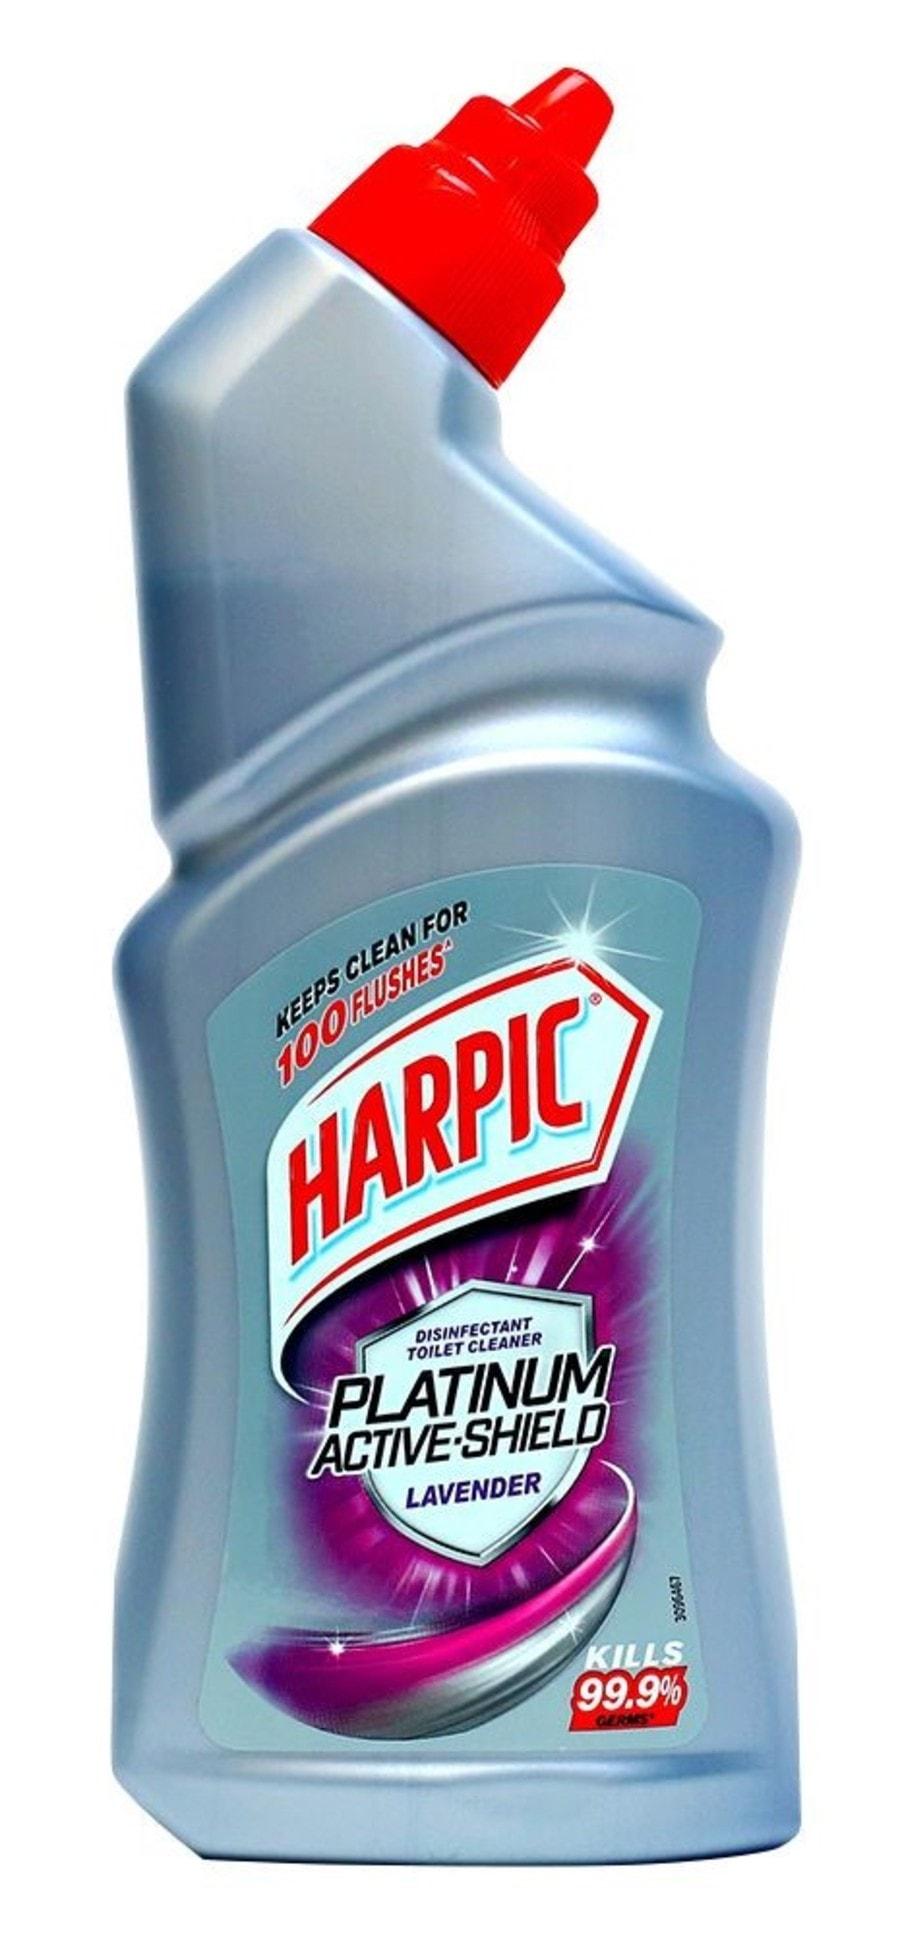 Harpic Active Platinum Lavender Toilet Cleaner  Bottle Of 500 Ml